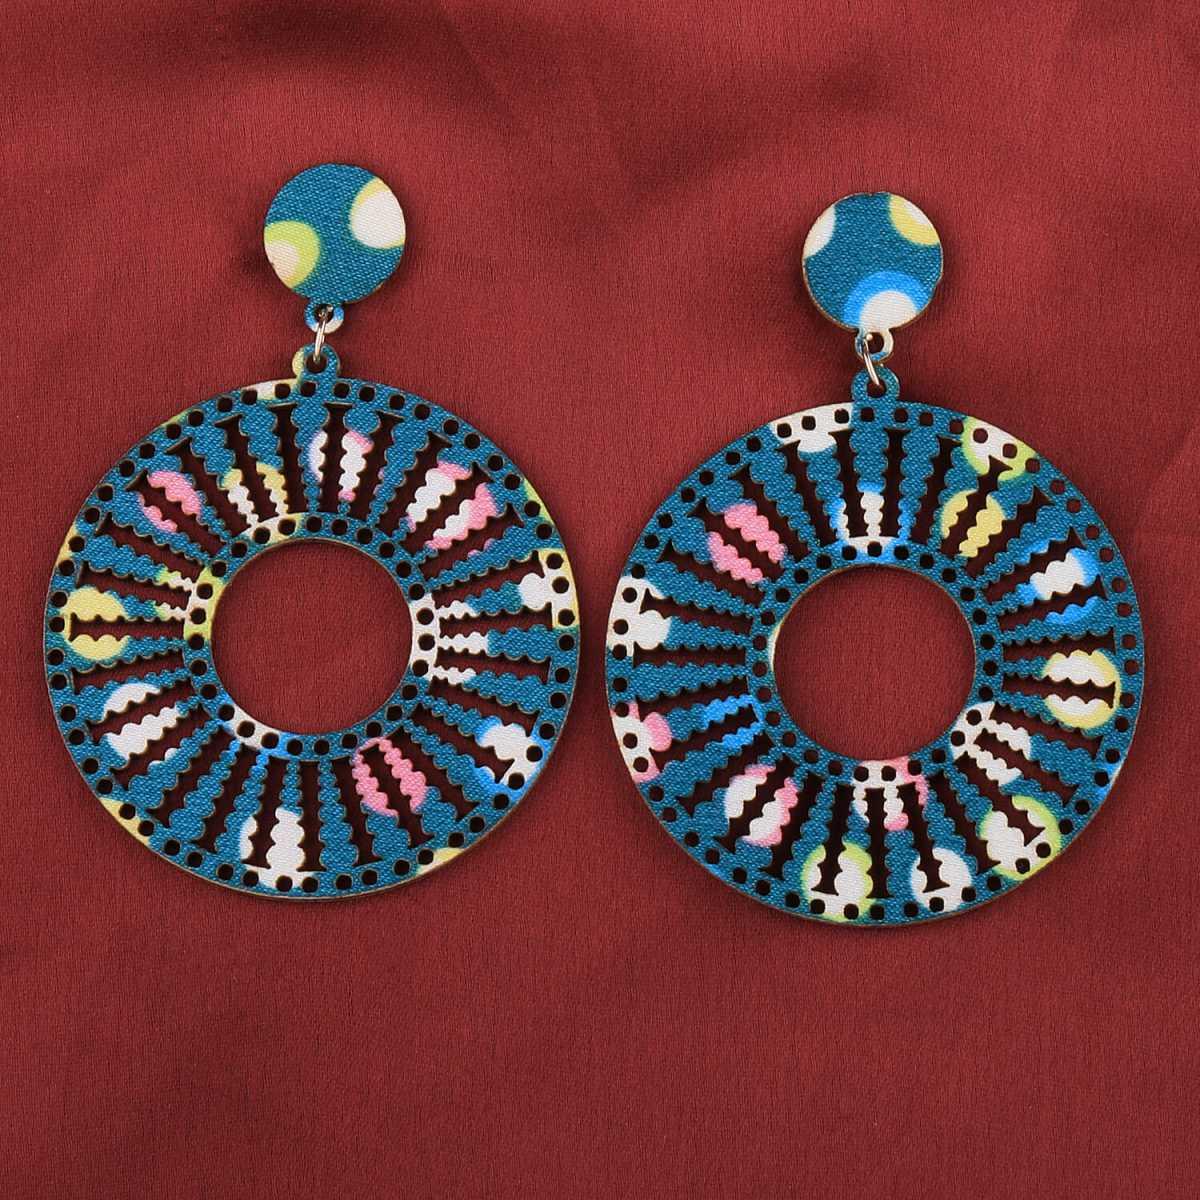 SILVER SHINE Delicate Natural Wooden Dangler Earrings for Girls and Women.